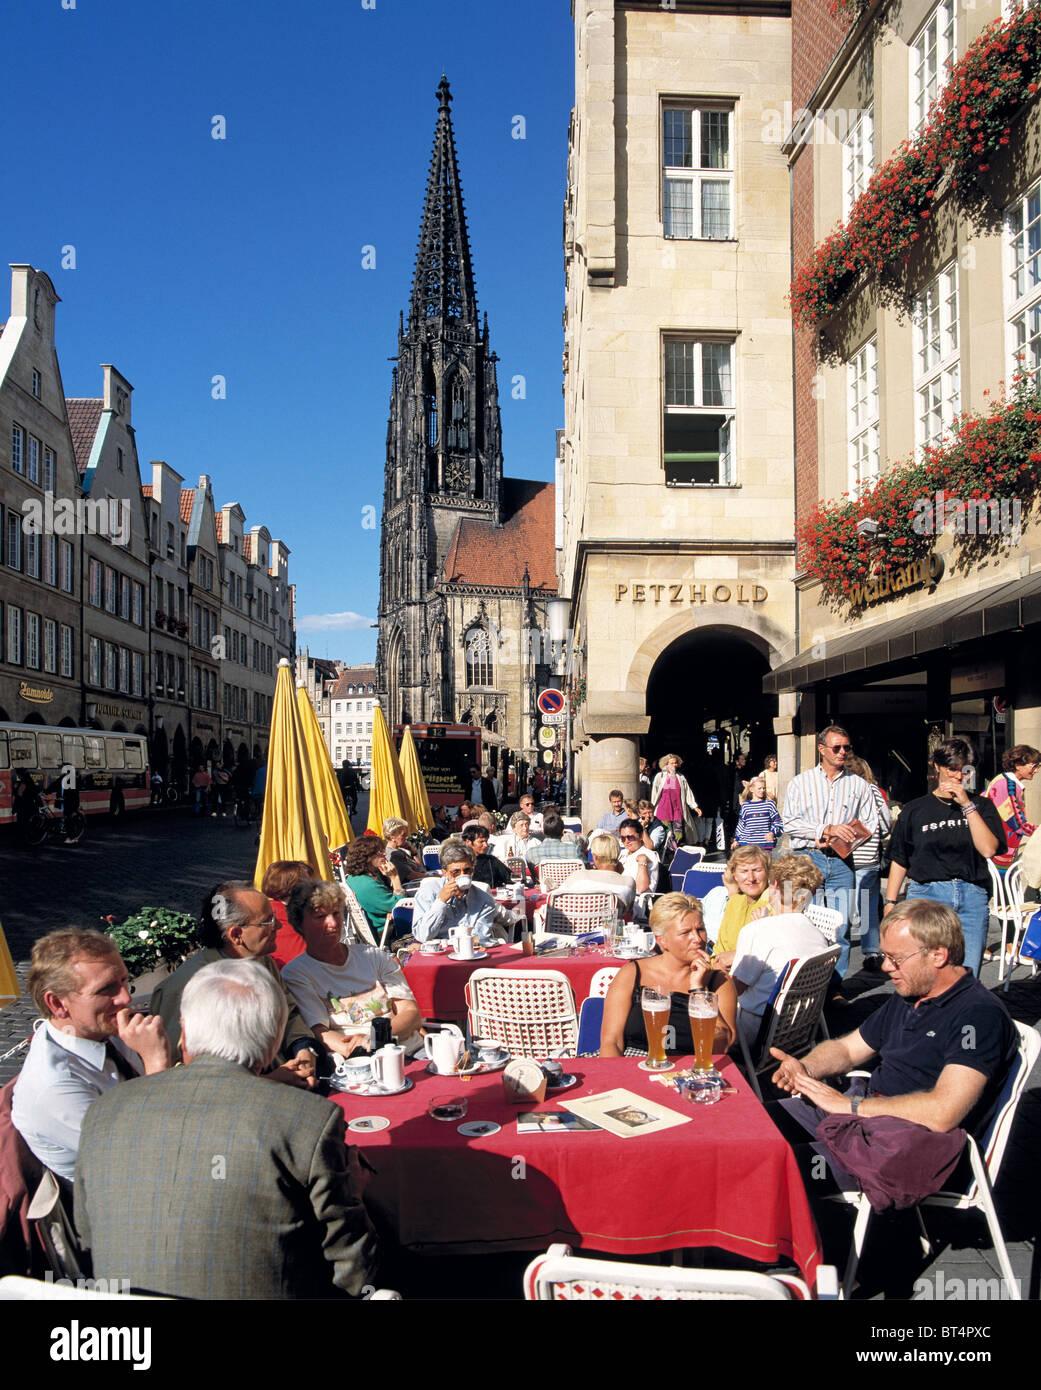 D-Muenster, Westphalia, Muensterland, North Rhine-Westphalia, Prinzipal Market Place, gable houses, archways, Saint - Stock Image